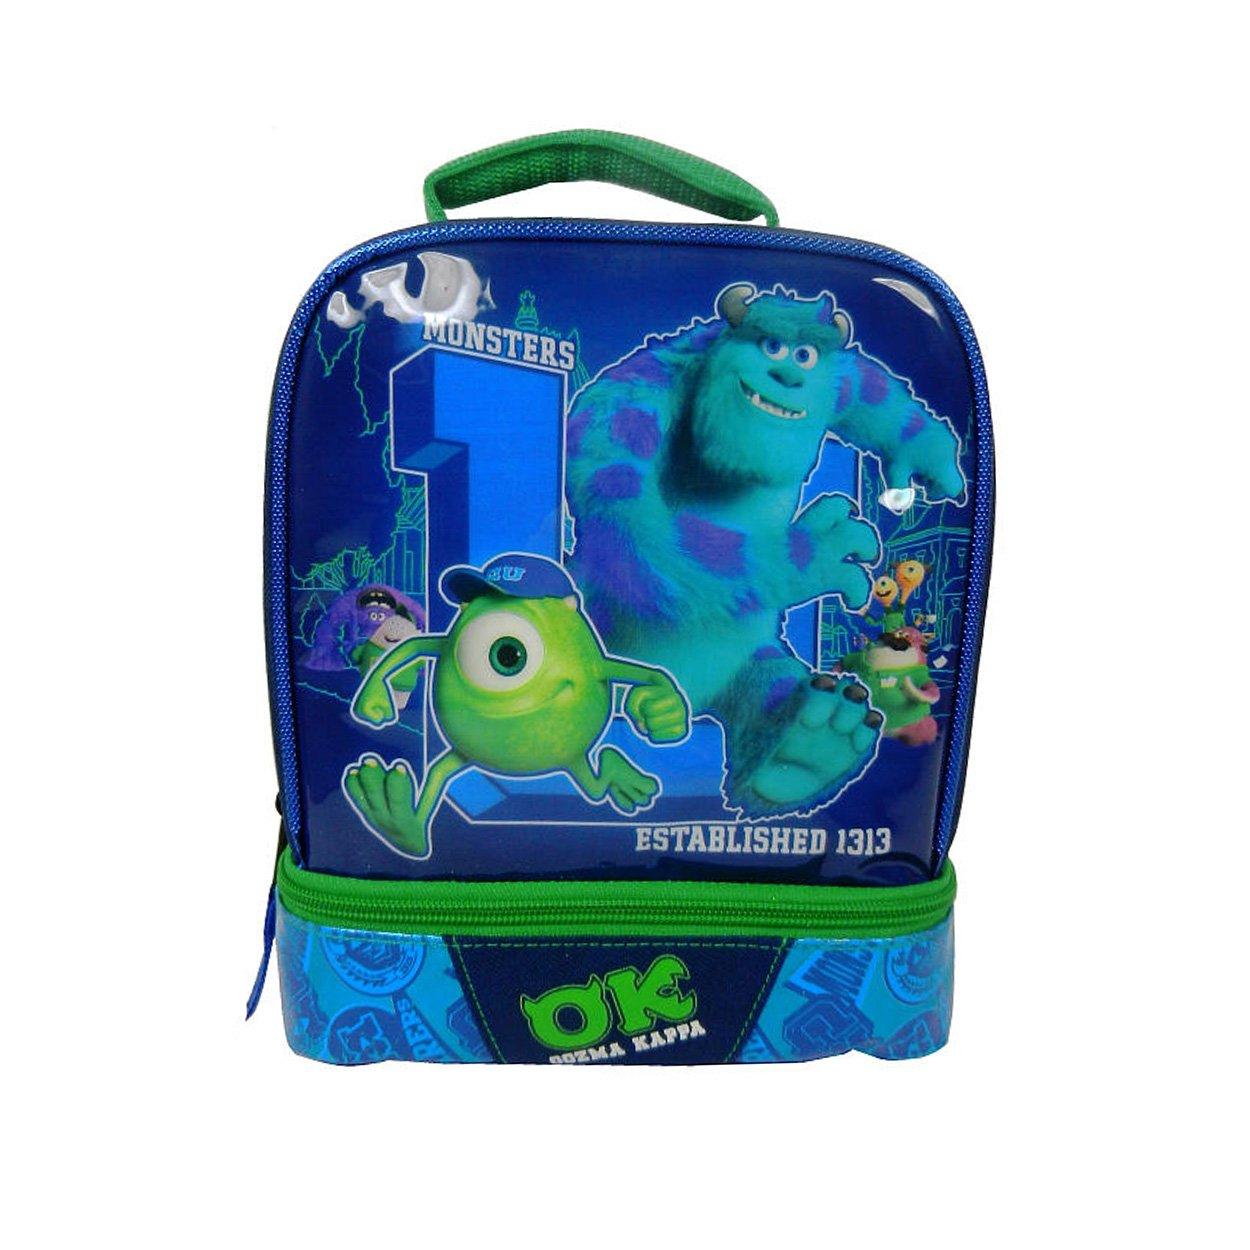 Monsters U OK Dual Compartment Kids Lunchbox